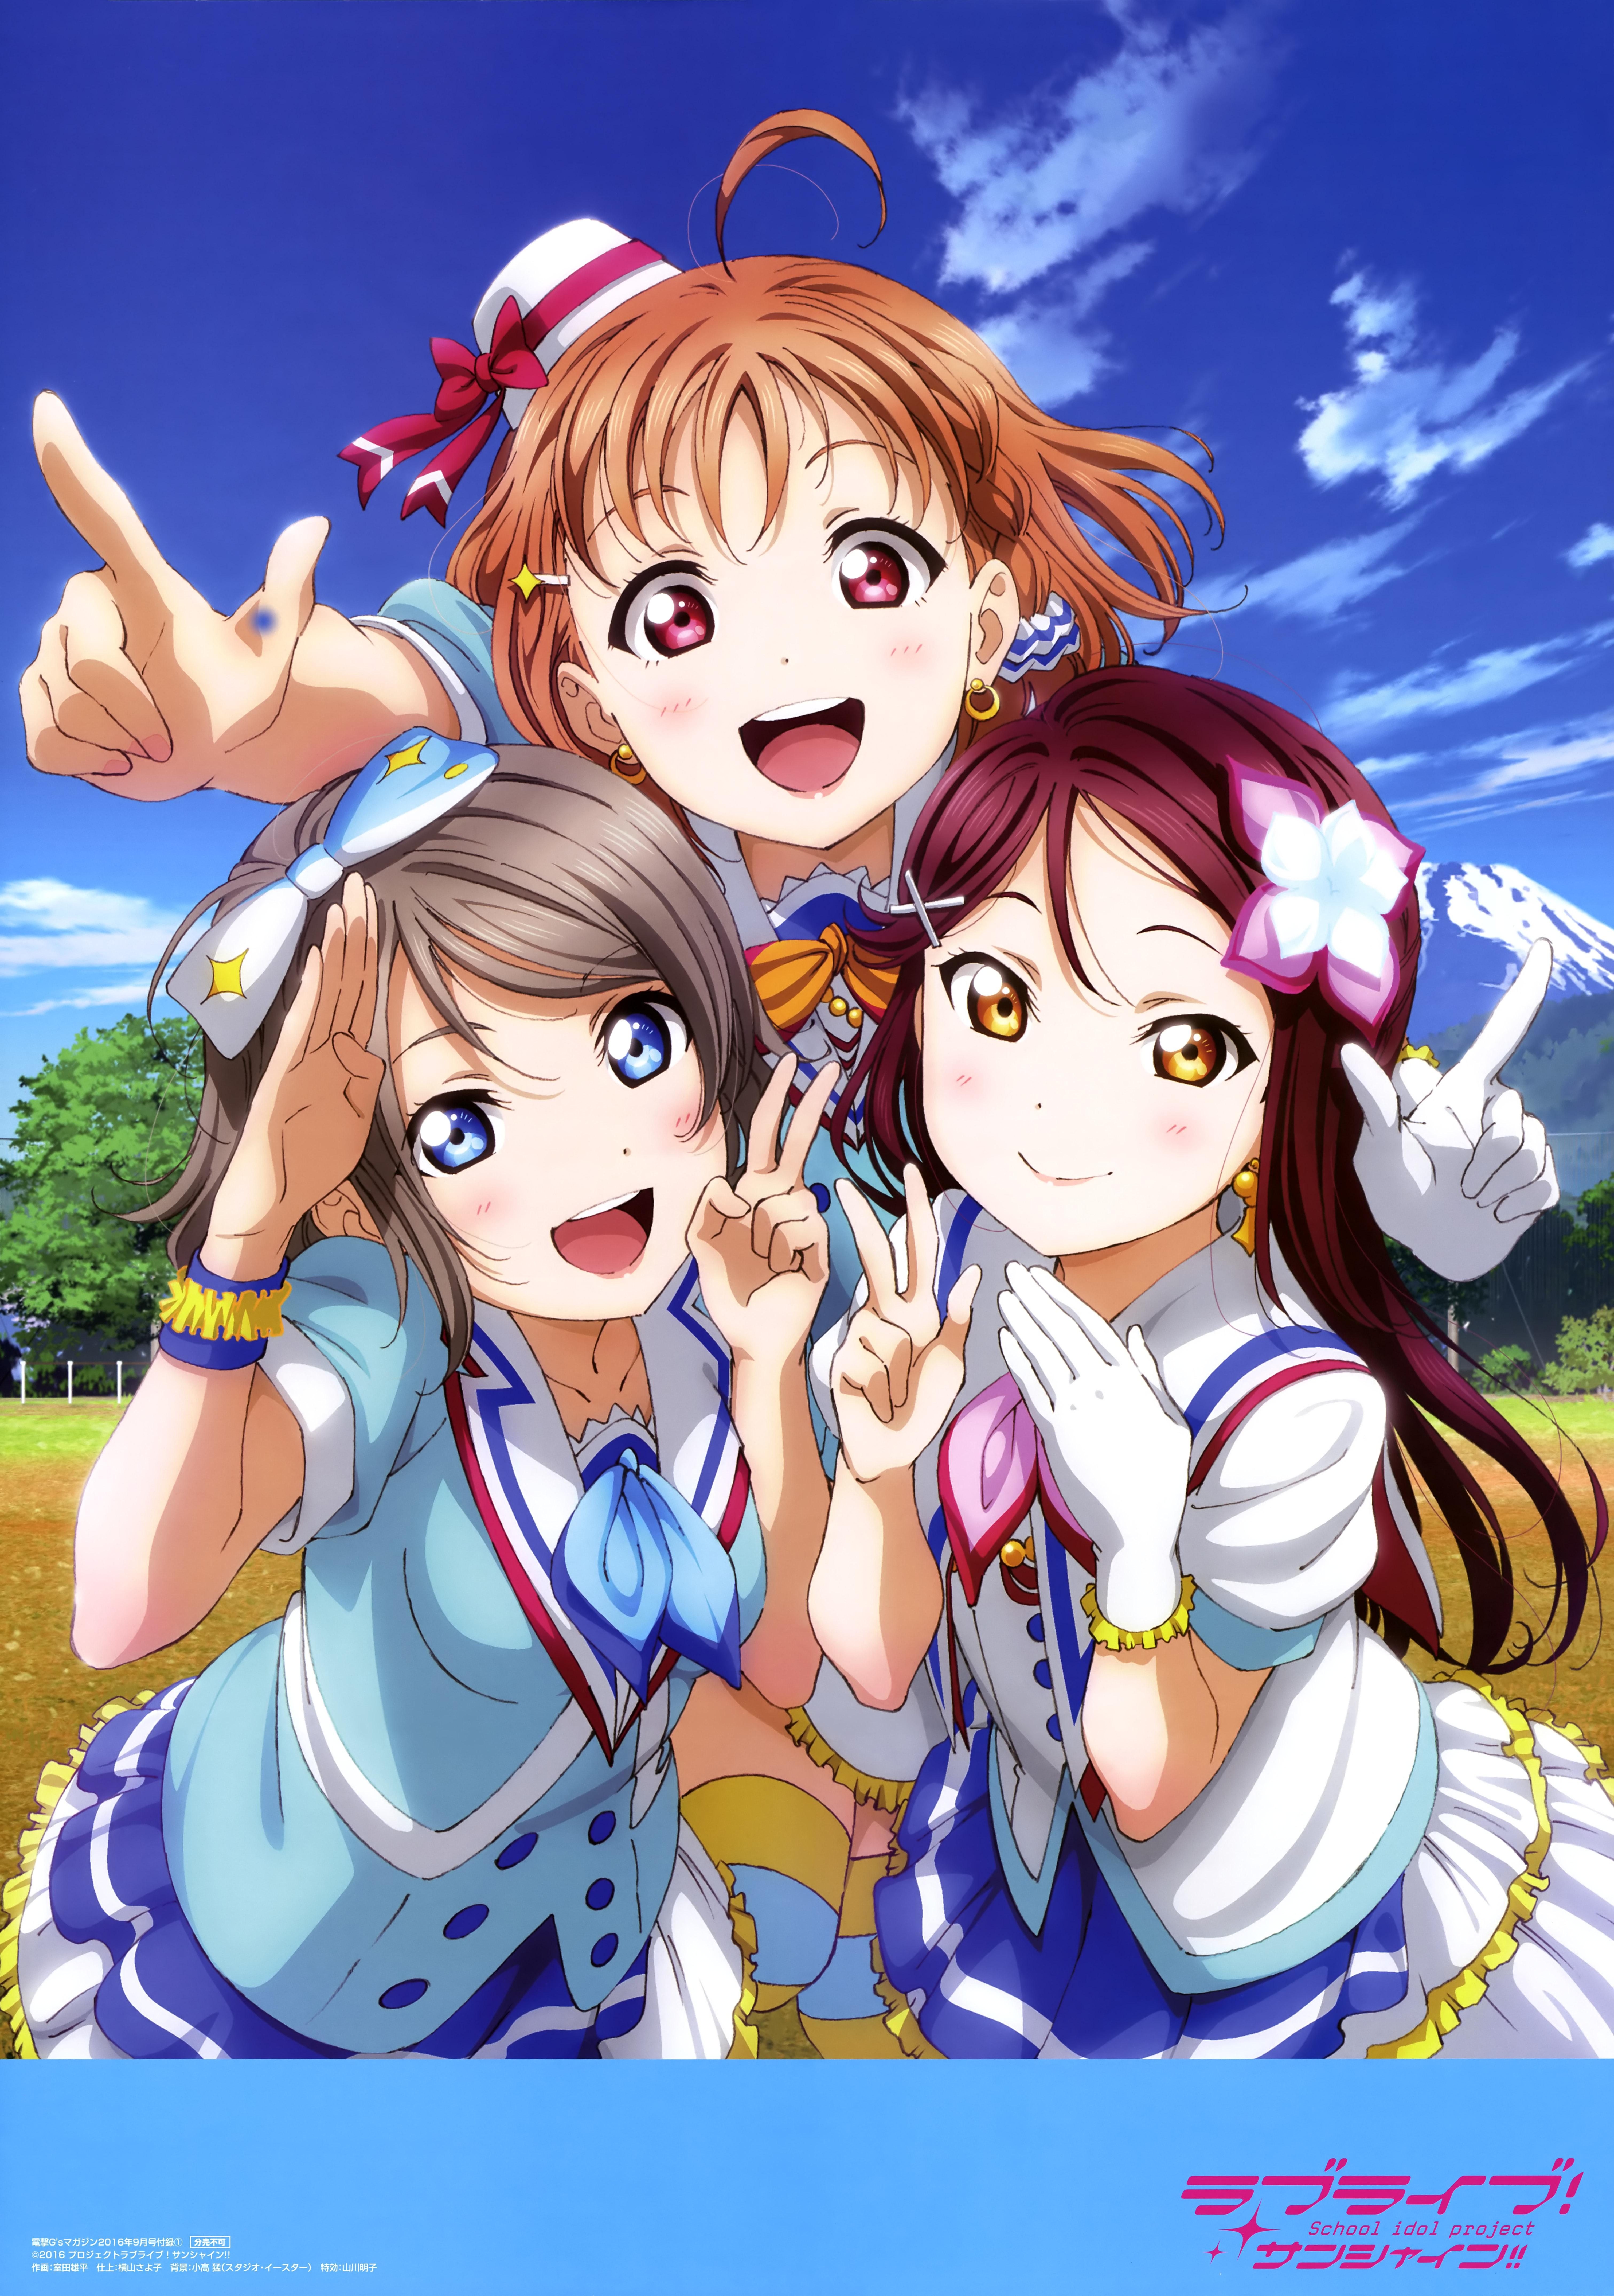 Love Live! Sunshine!! - Wallpaper and Scan Gallery - Minitokyo